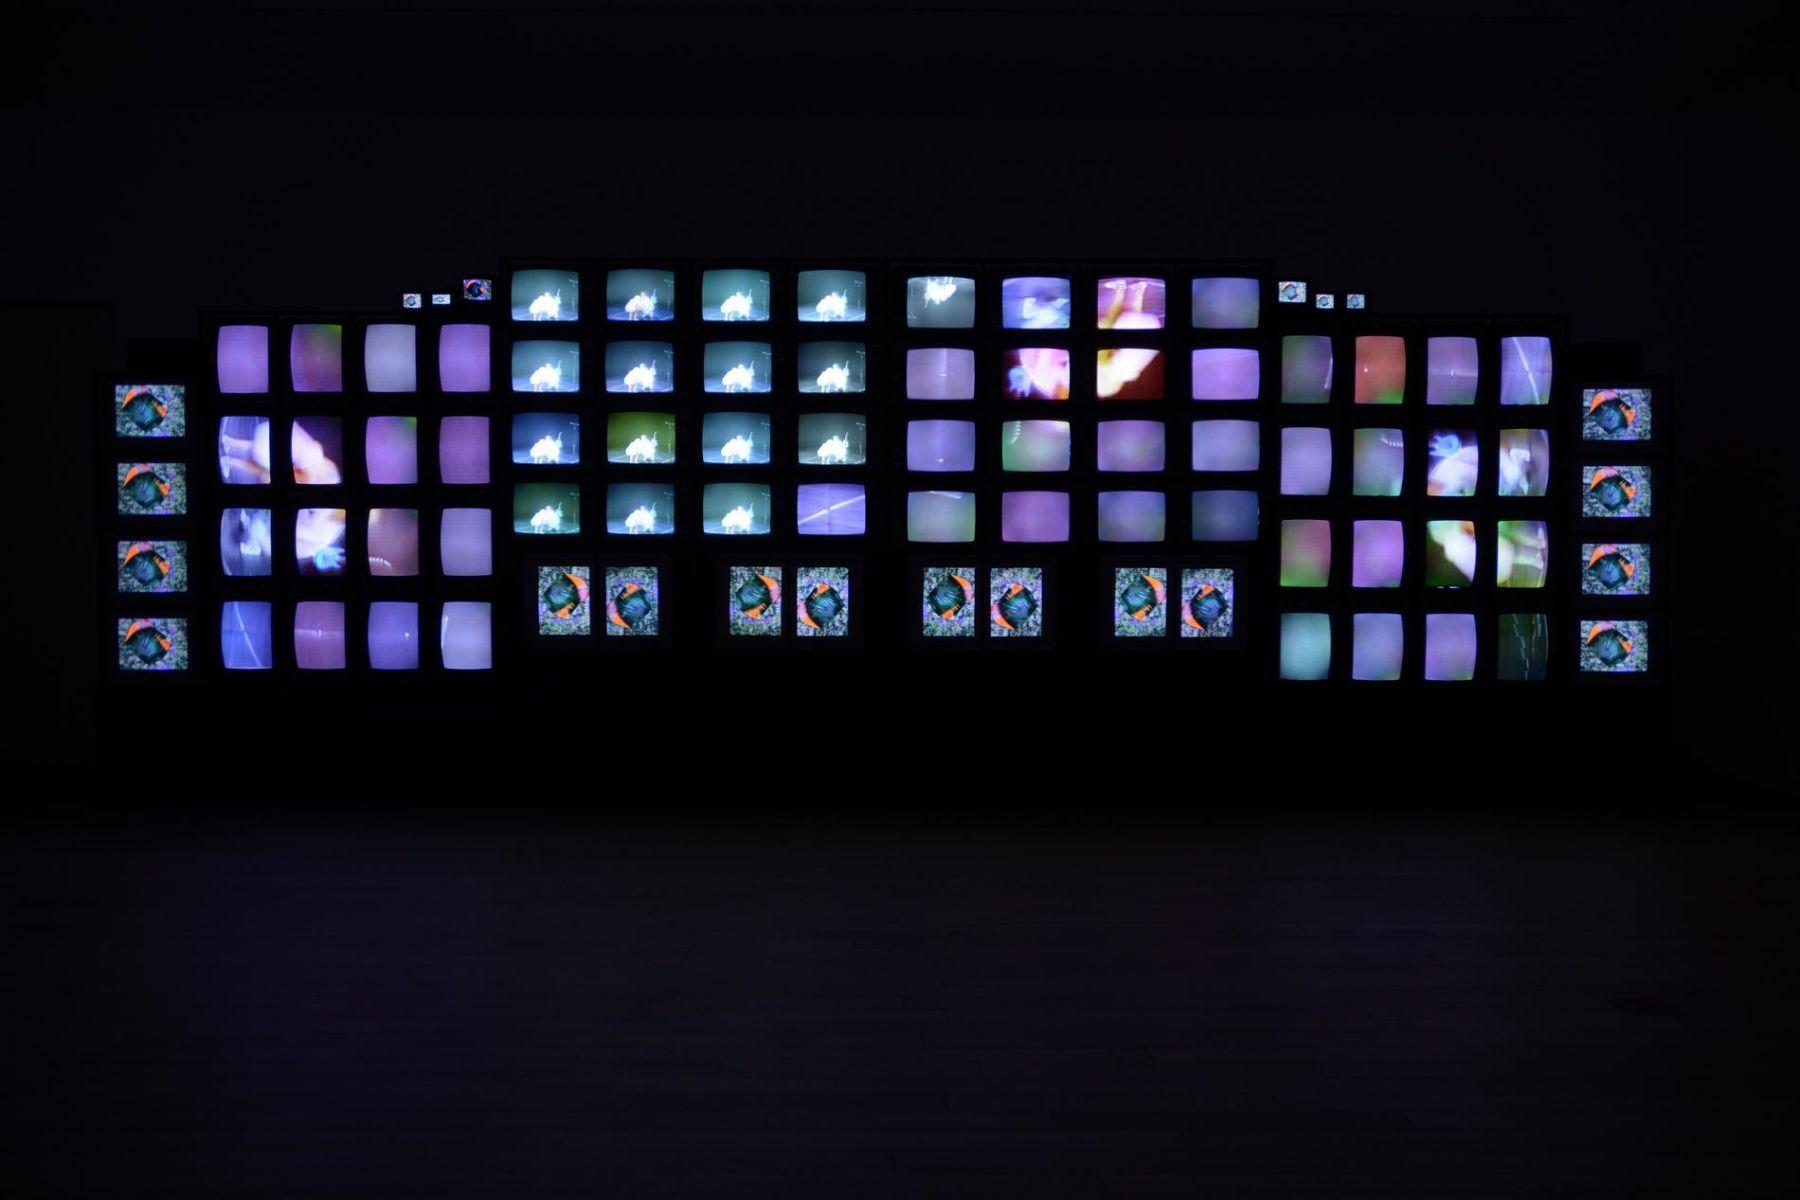 , NAM JUNE PAIK M200/Video Wall,1991Television monitors118 1/16 x 377 15/16 x 19 5/8 in. (300 x 960 x 50 cm)